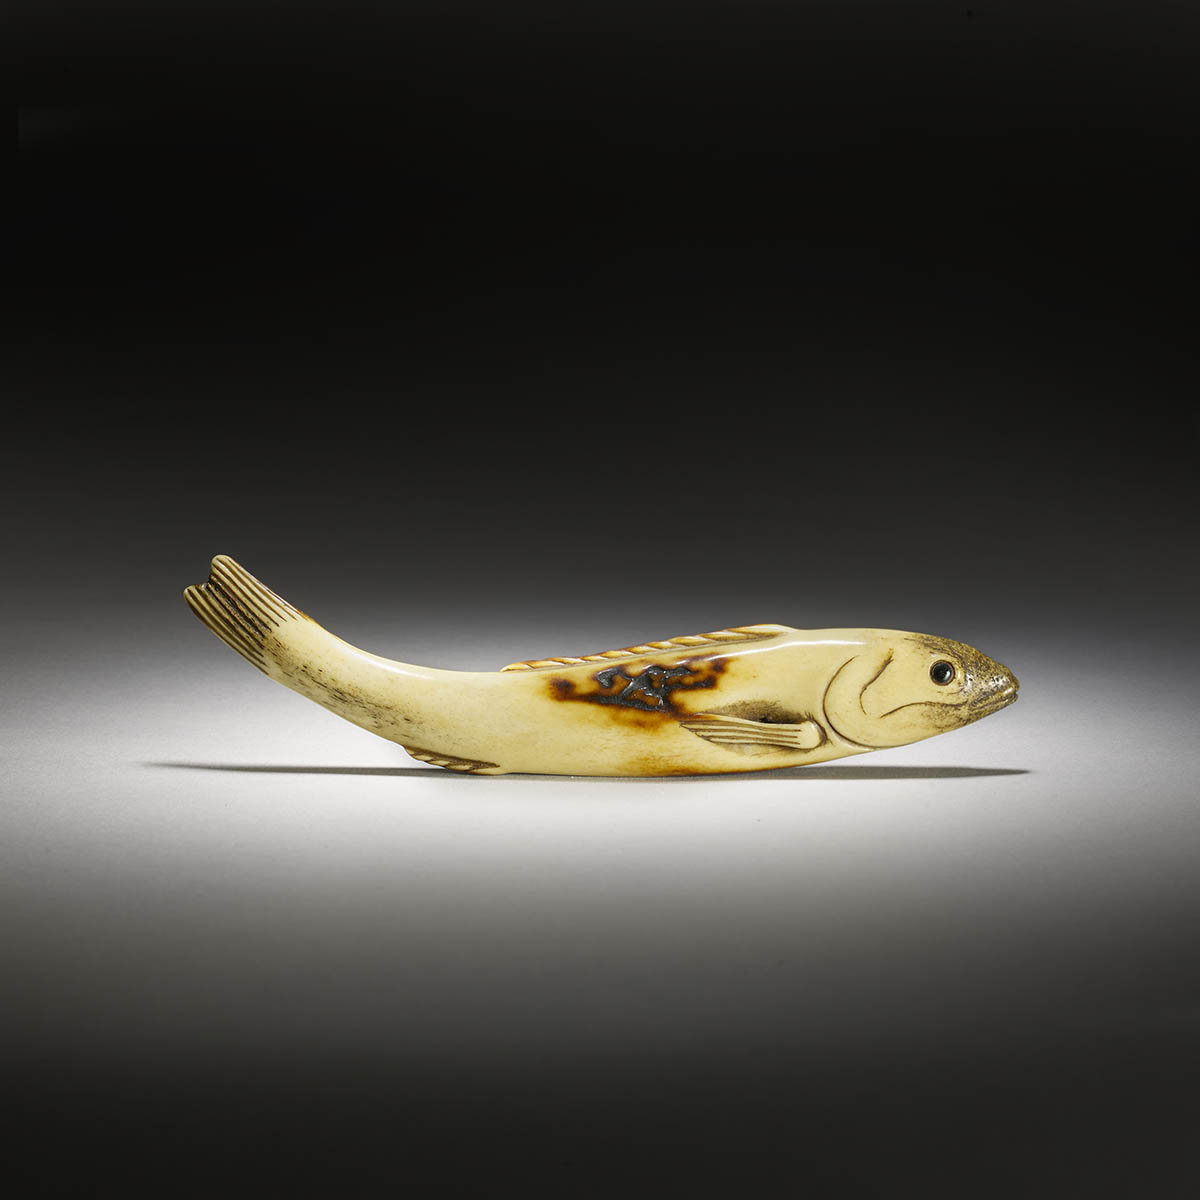 Stag antler sashi netsuke of a fish